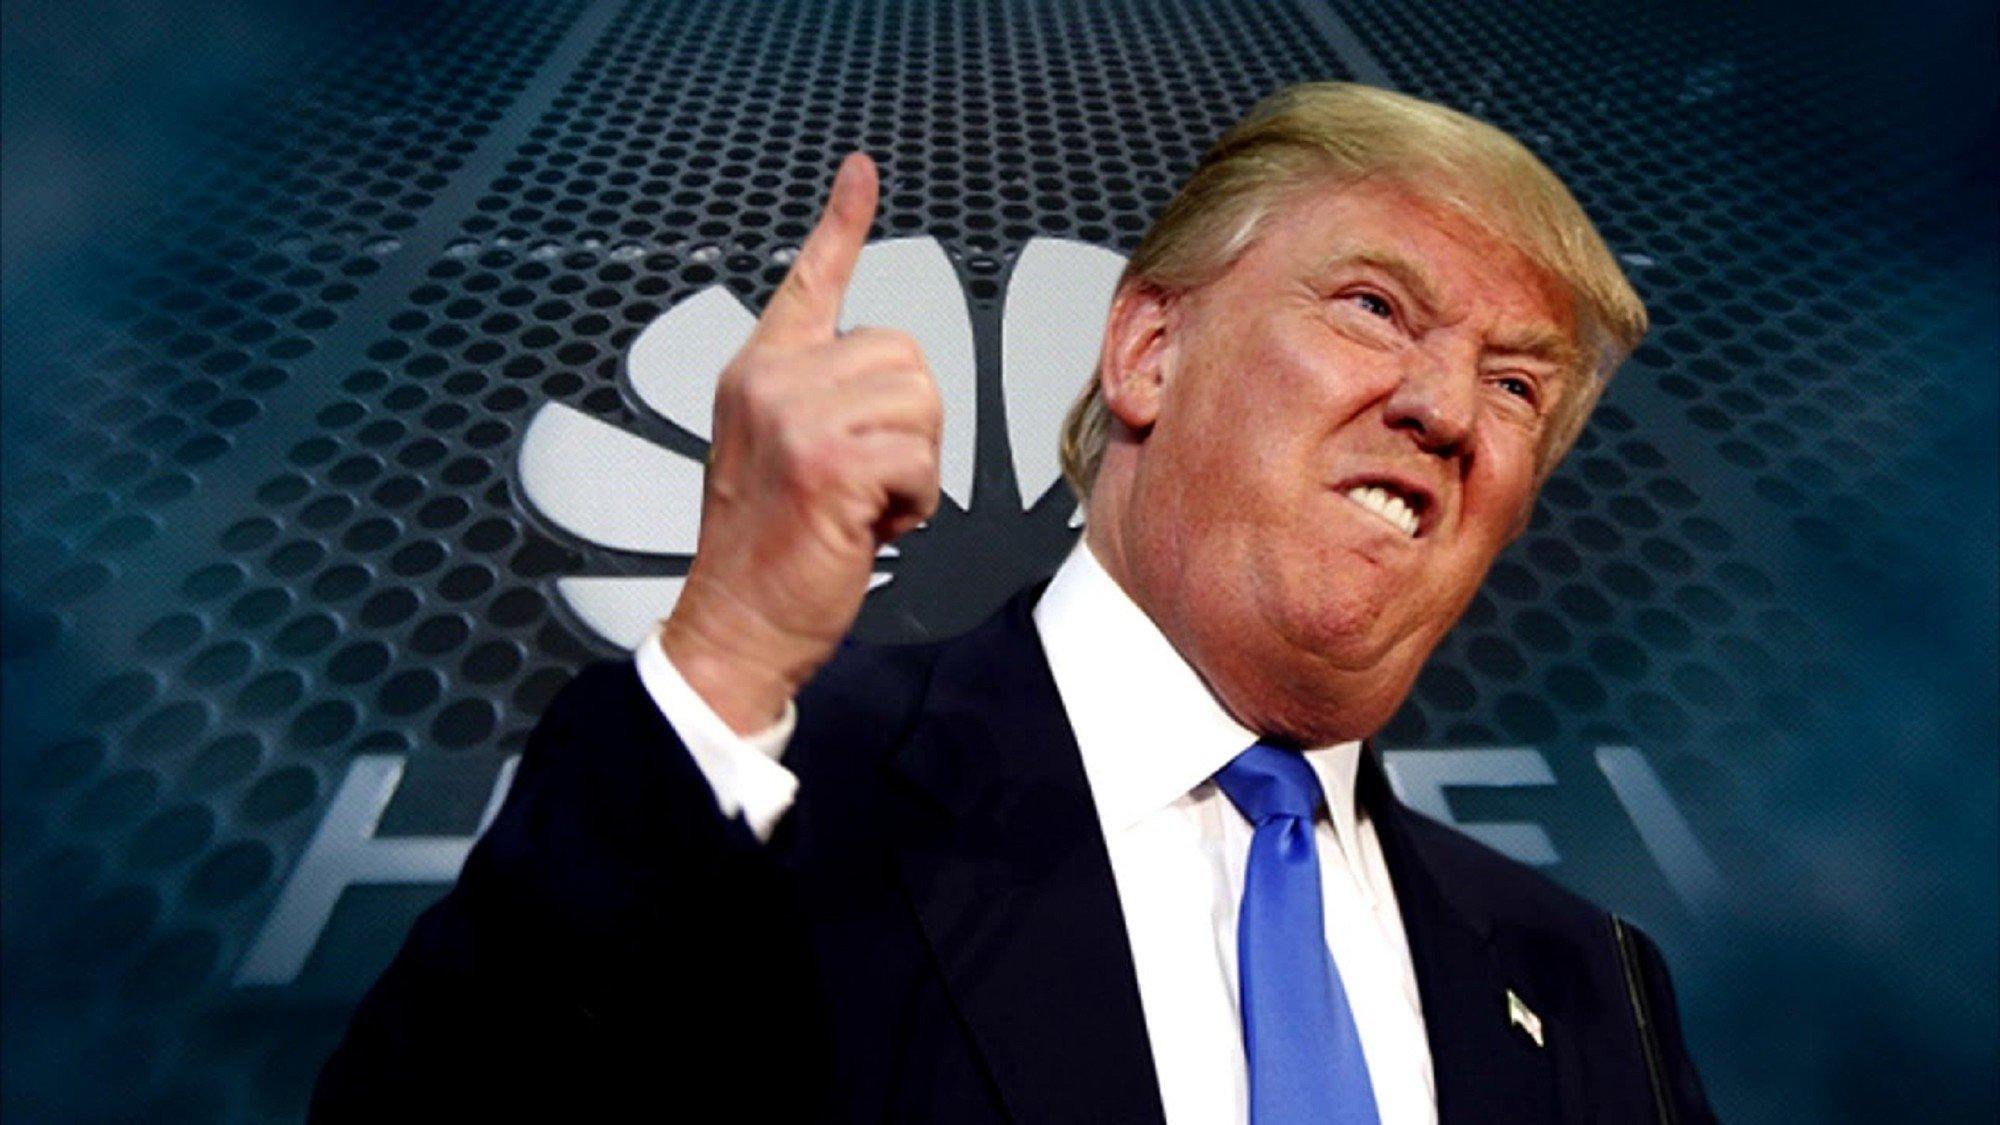 Трамп объявил о прекращении иммиграции в США